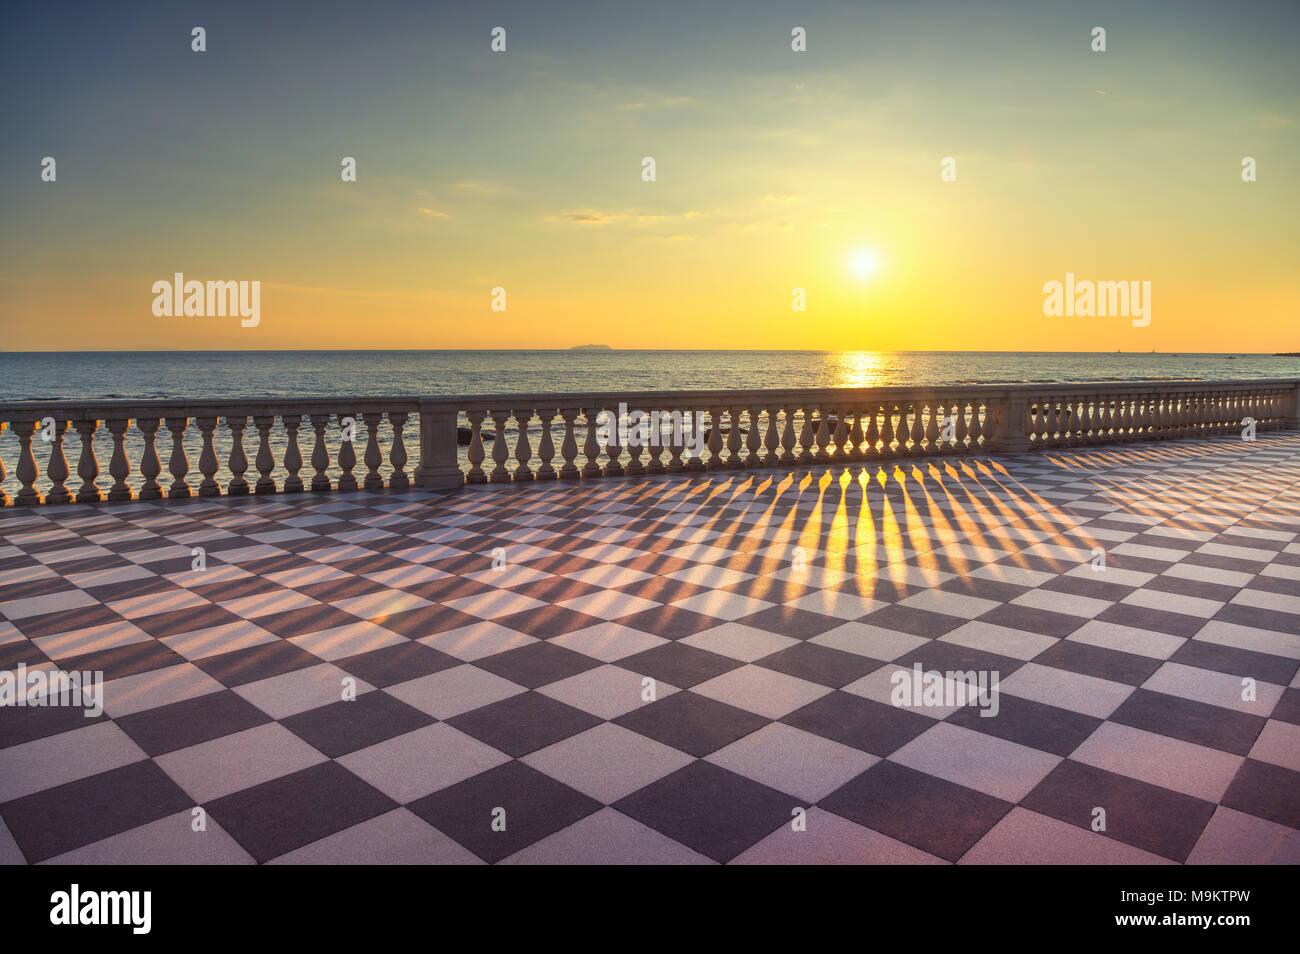 Mascagni Terrazza Terrace Belvedere Seafront Atr Sunset